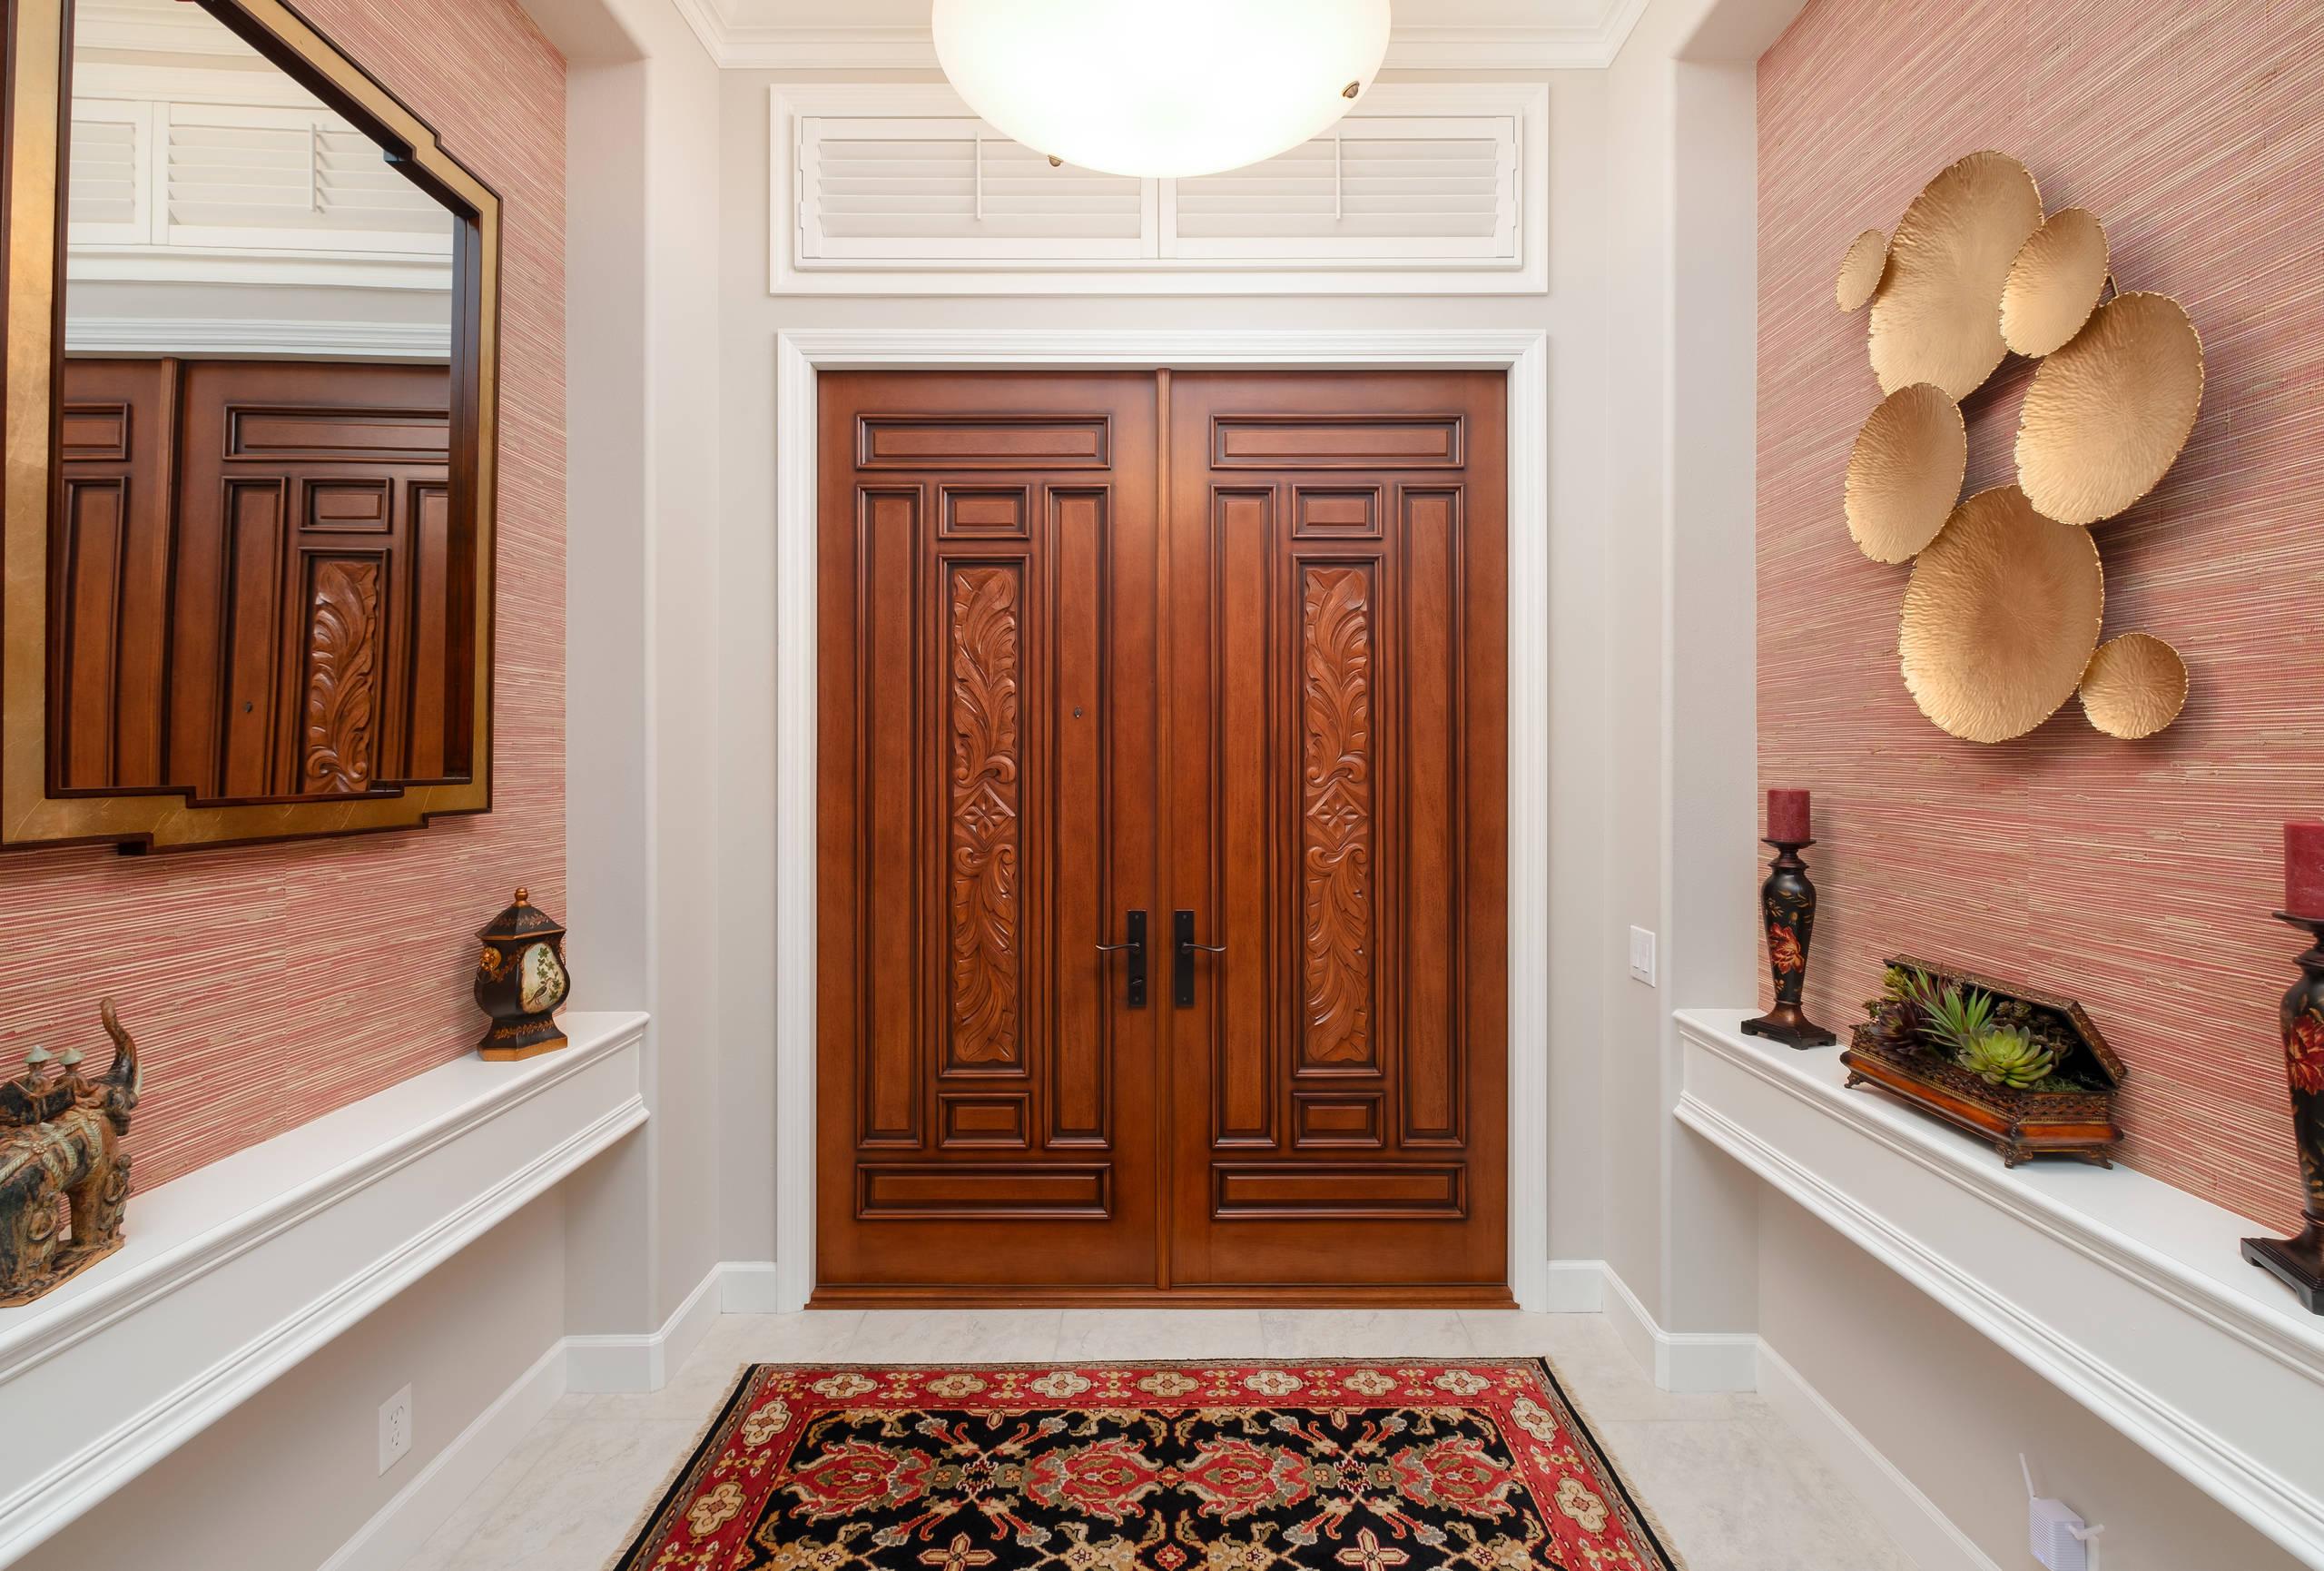 Rosedale Aurora Entry Door Renovation